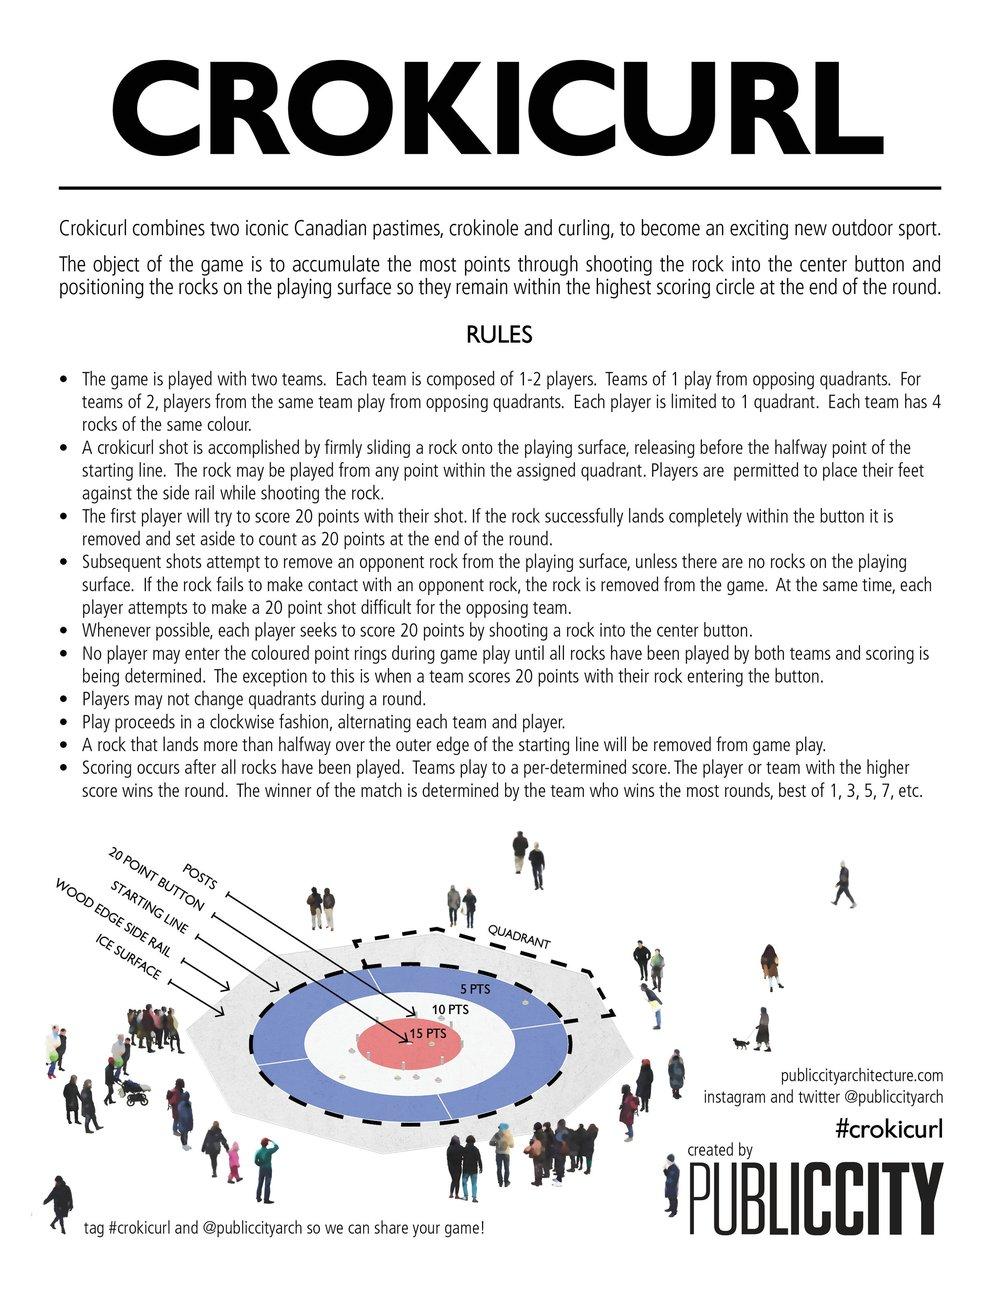 Crokicurl_Public City_Rules.jpg